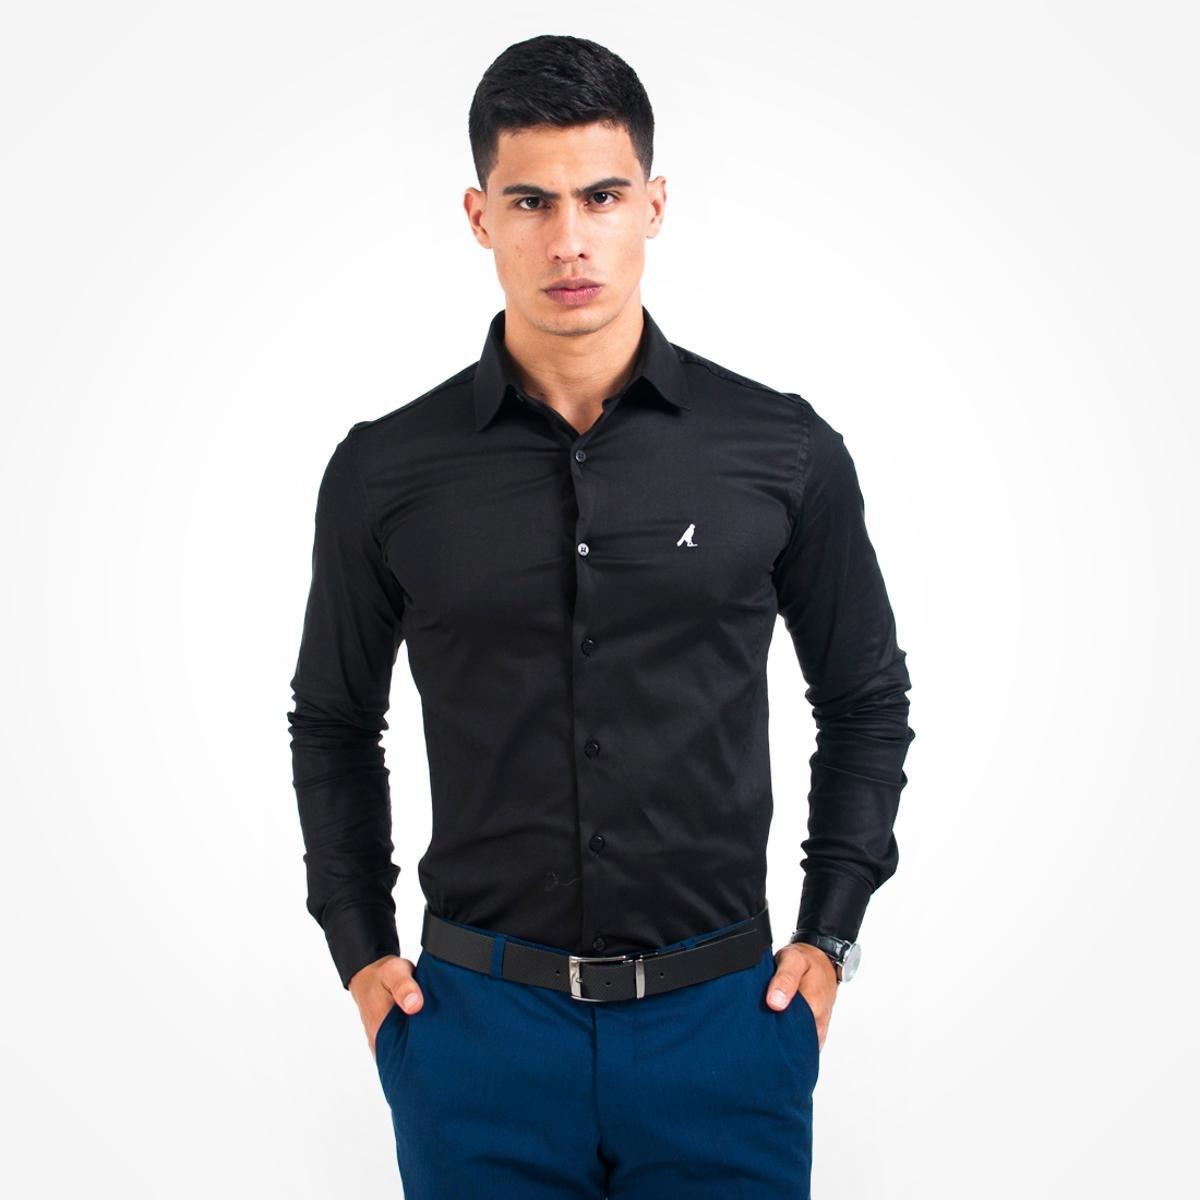 Camisa Social Masculina - Super Slim - Preto - Compre Agora   Zattini 0930de08d4